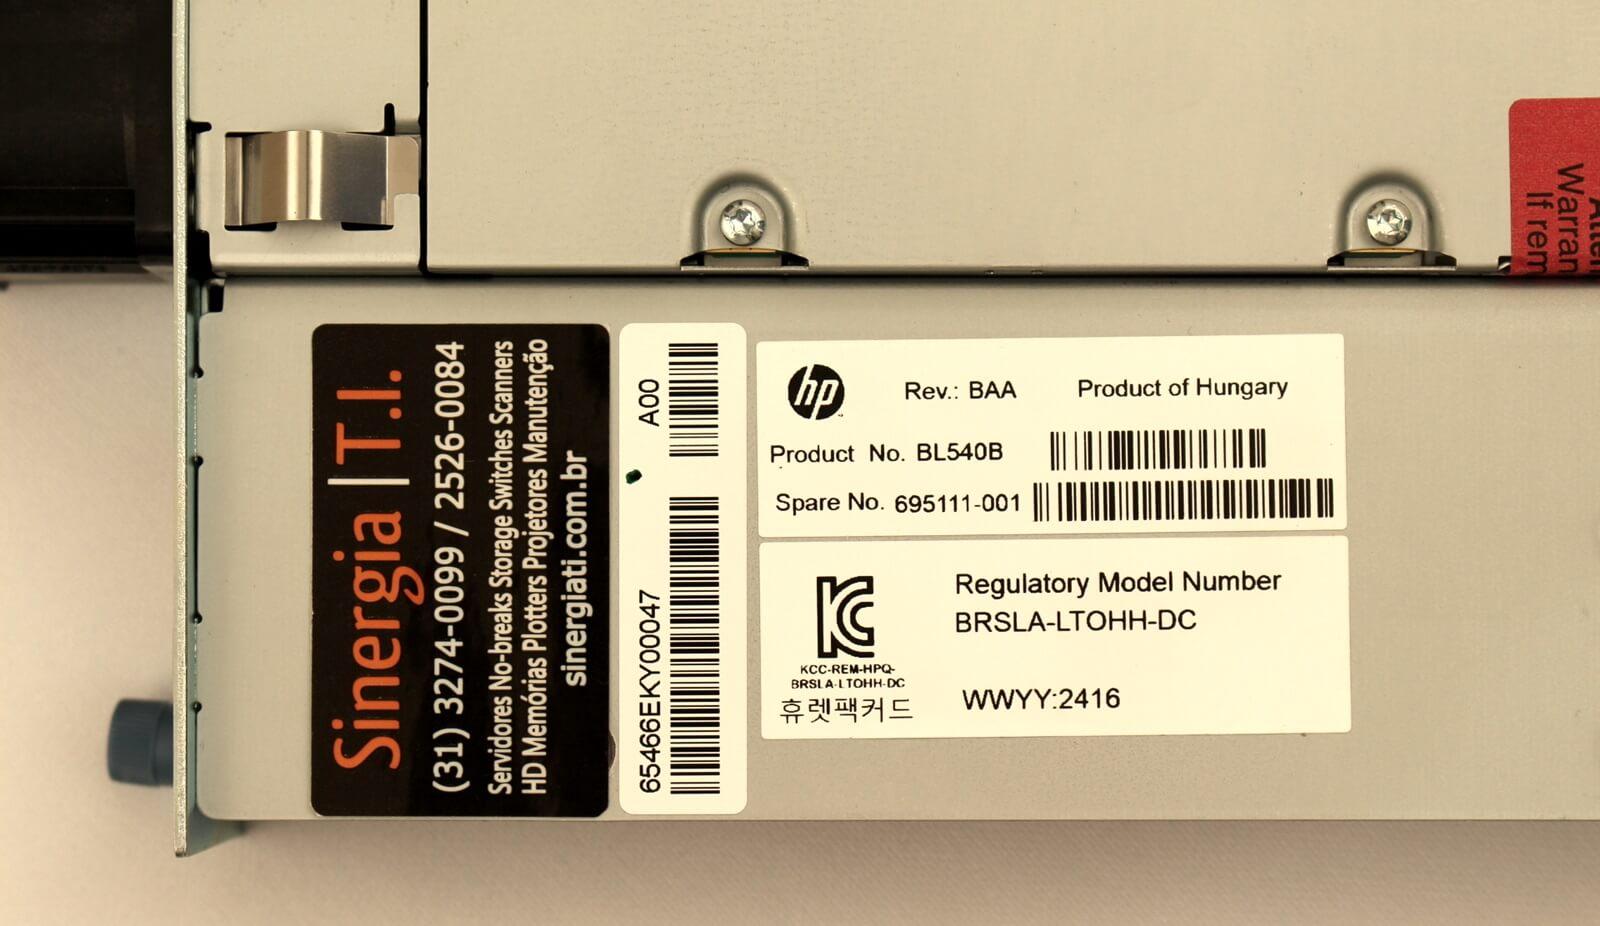 BL540B Product No. HP Tape Drive LTO-5 para Uso em Unidade Robótica MSL2024 AK379A Spare: 695111-001 label3